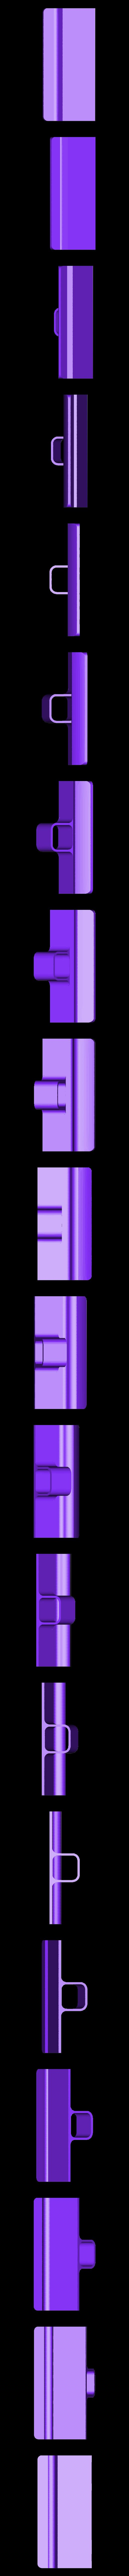 Outlet_Shelf.stl Download free STL file Wall Outlet Shelf • Object to 3D print, WallTosh